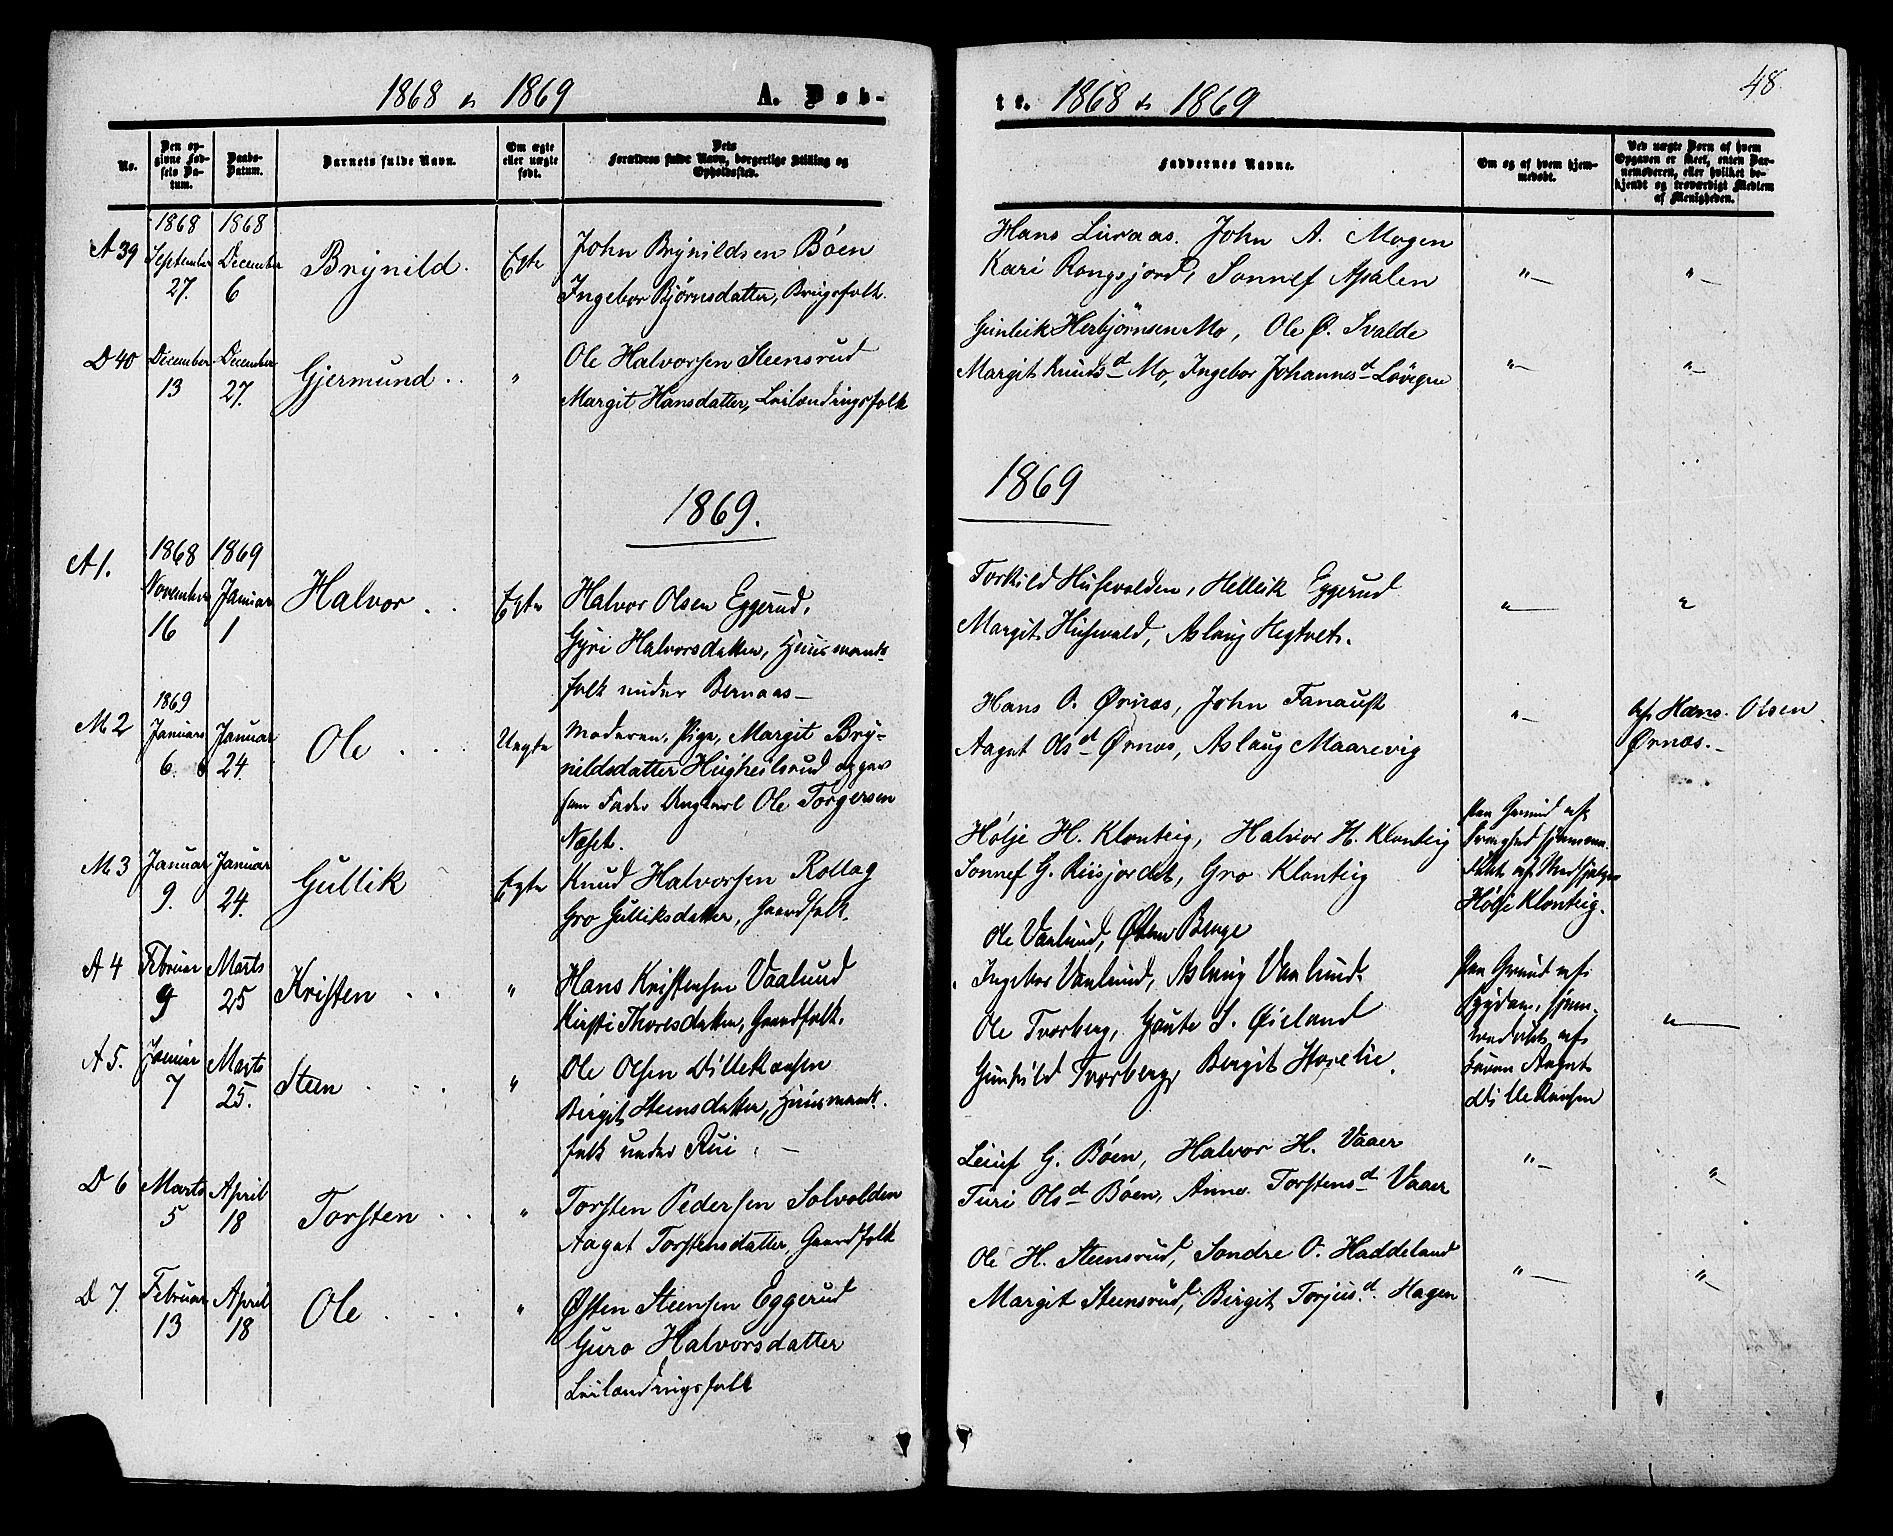 SAKO, Tinn kirkebøker, F/Fa/L0006: Ministerialbok nr. I 6, 1857-1878, s. 48